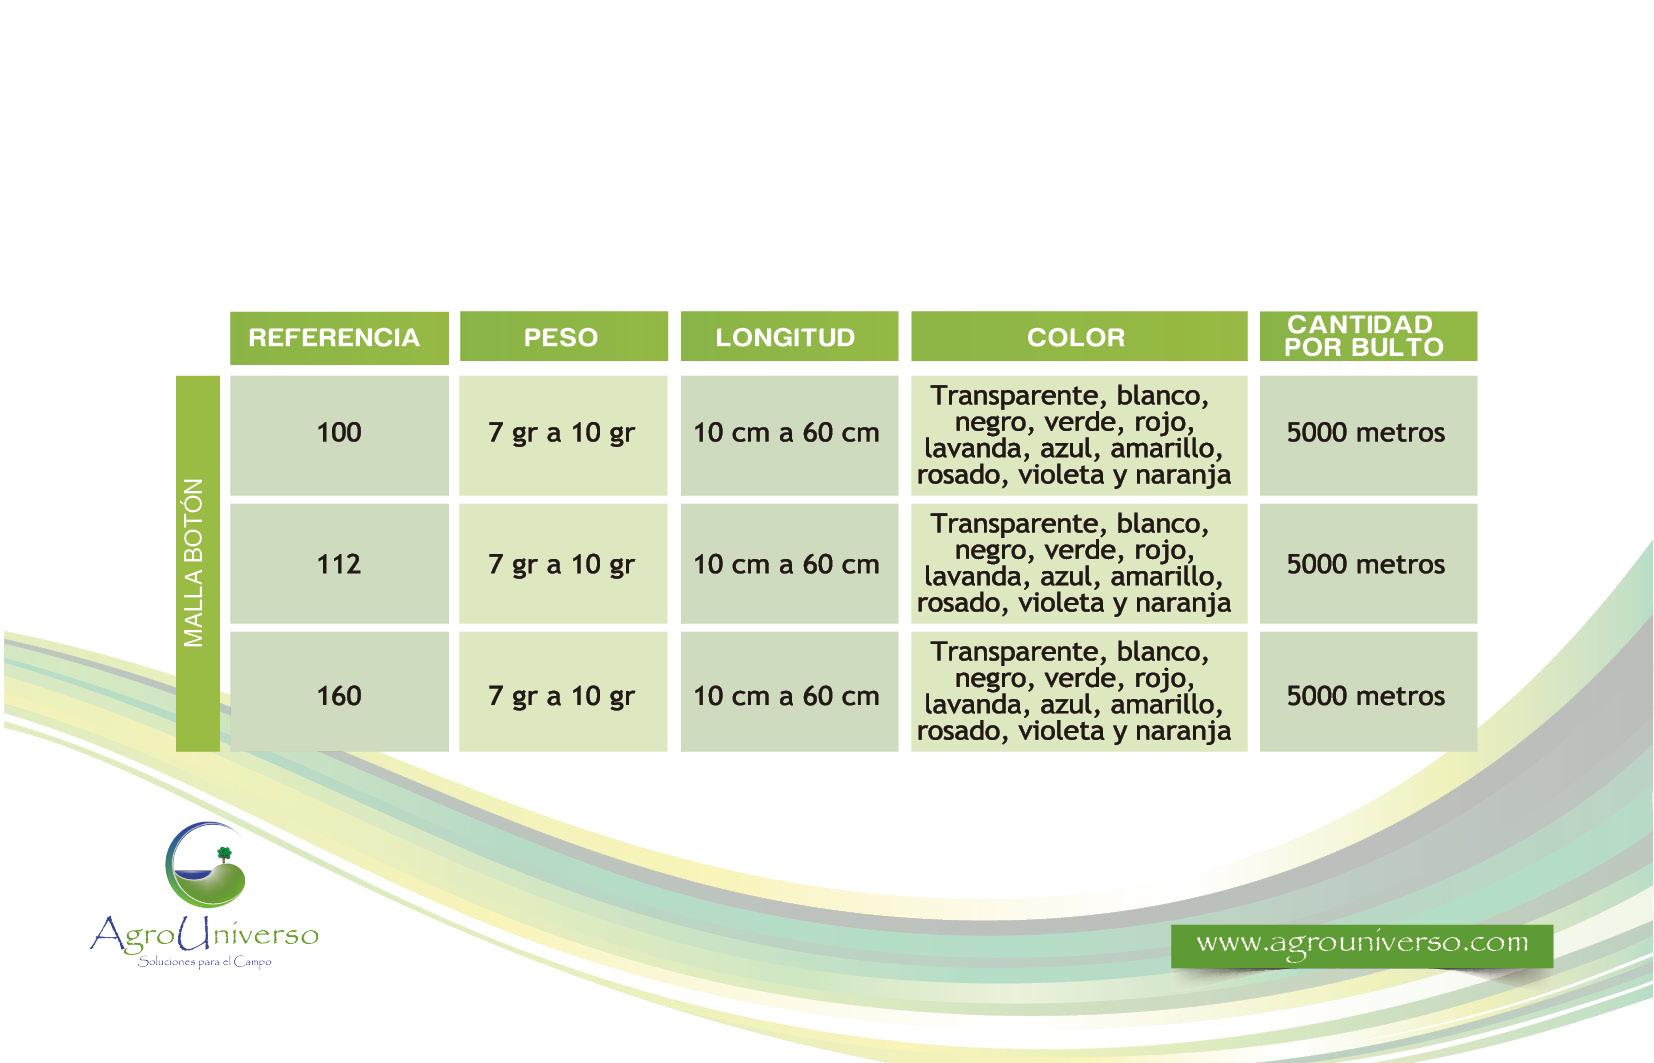 Catlogo-de-productos-Agrouniverso-13